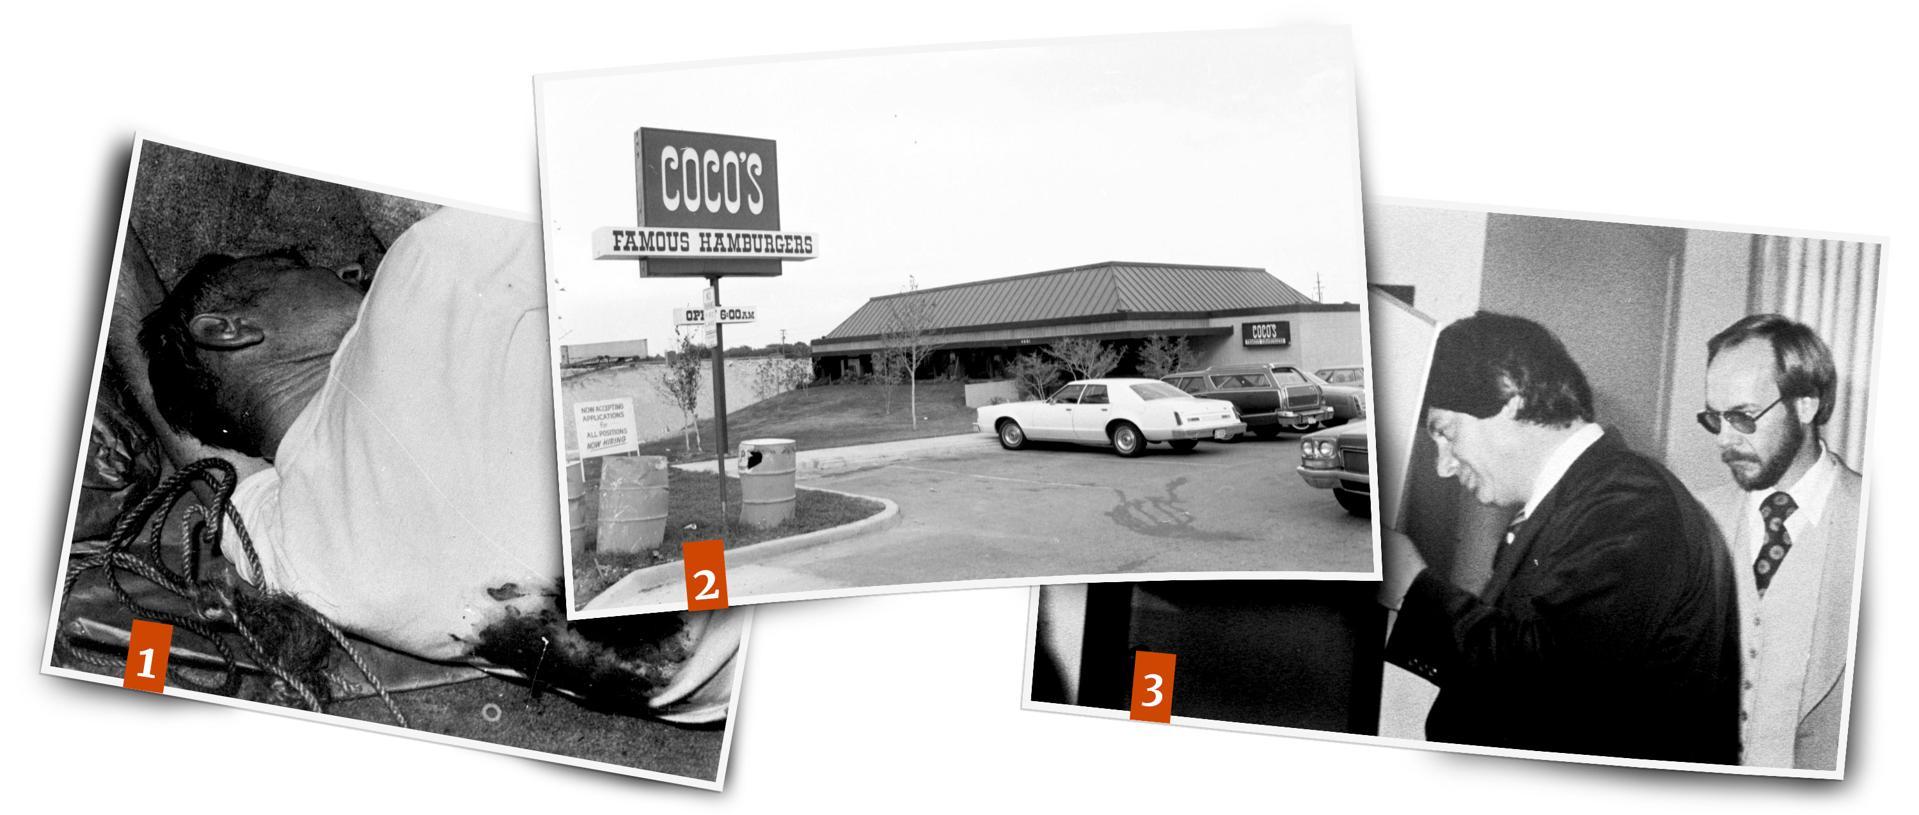 Cullen Davis murder for hire plot photos Fort Worth Star-Telegram Collection, University of Texas at Arlington Libraries